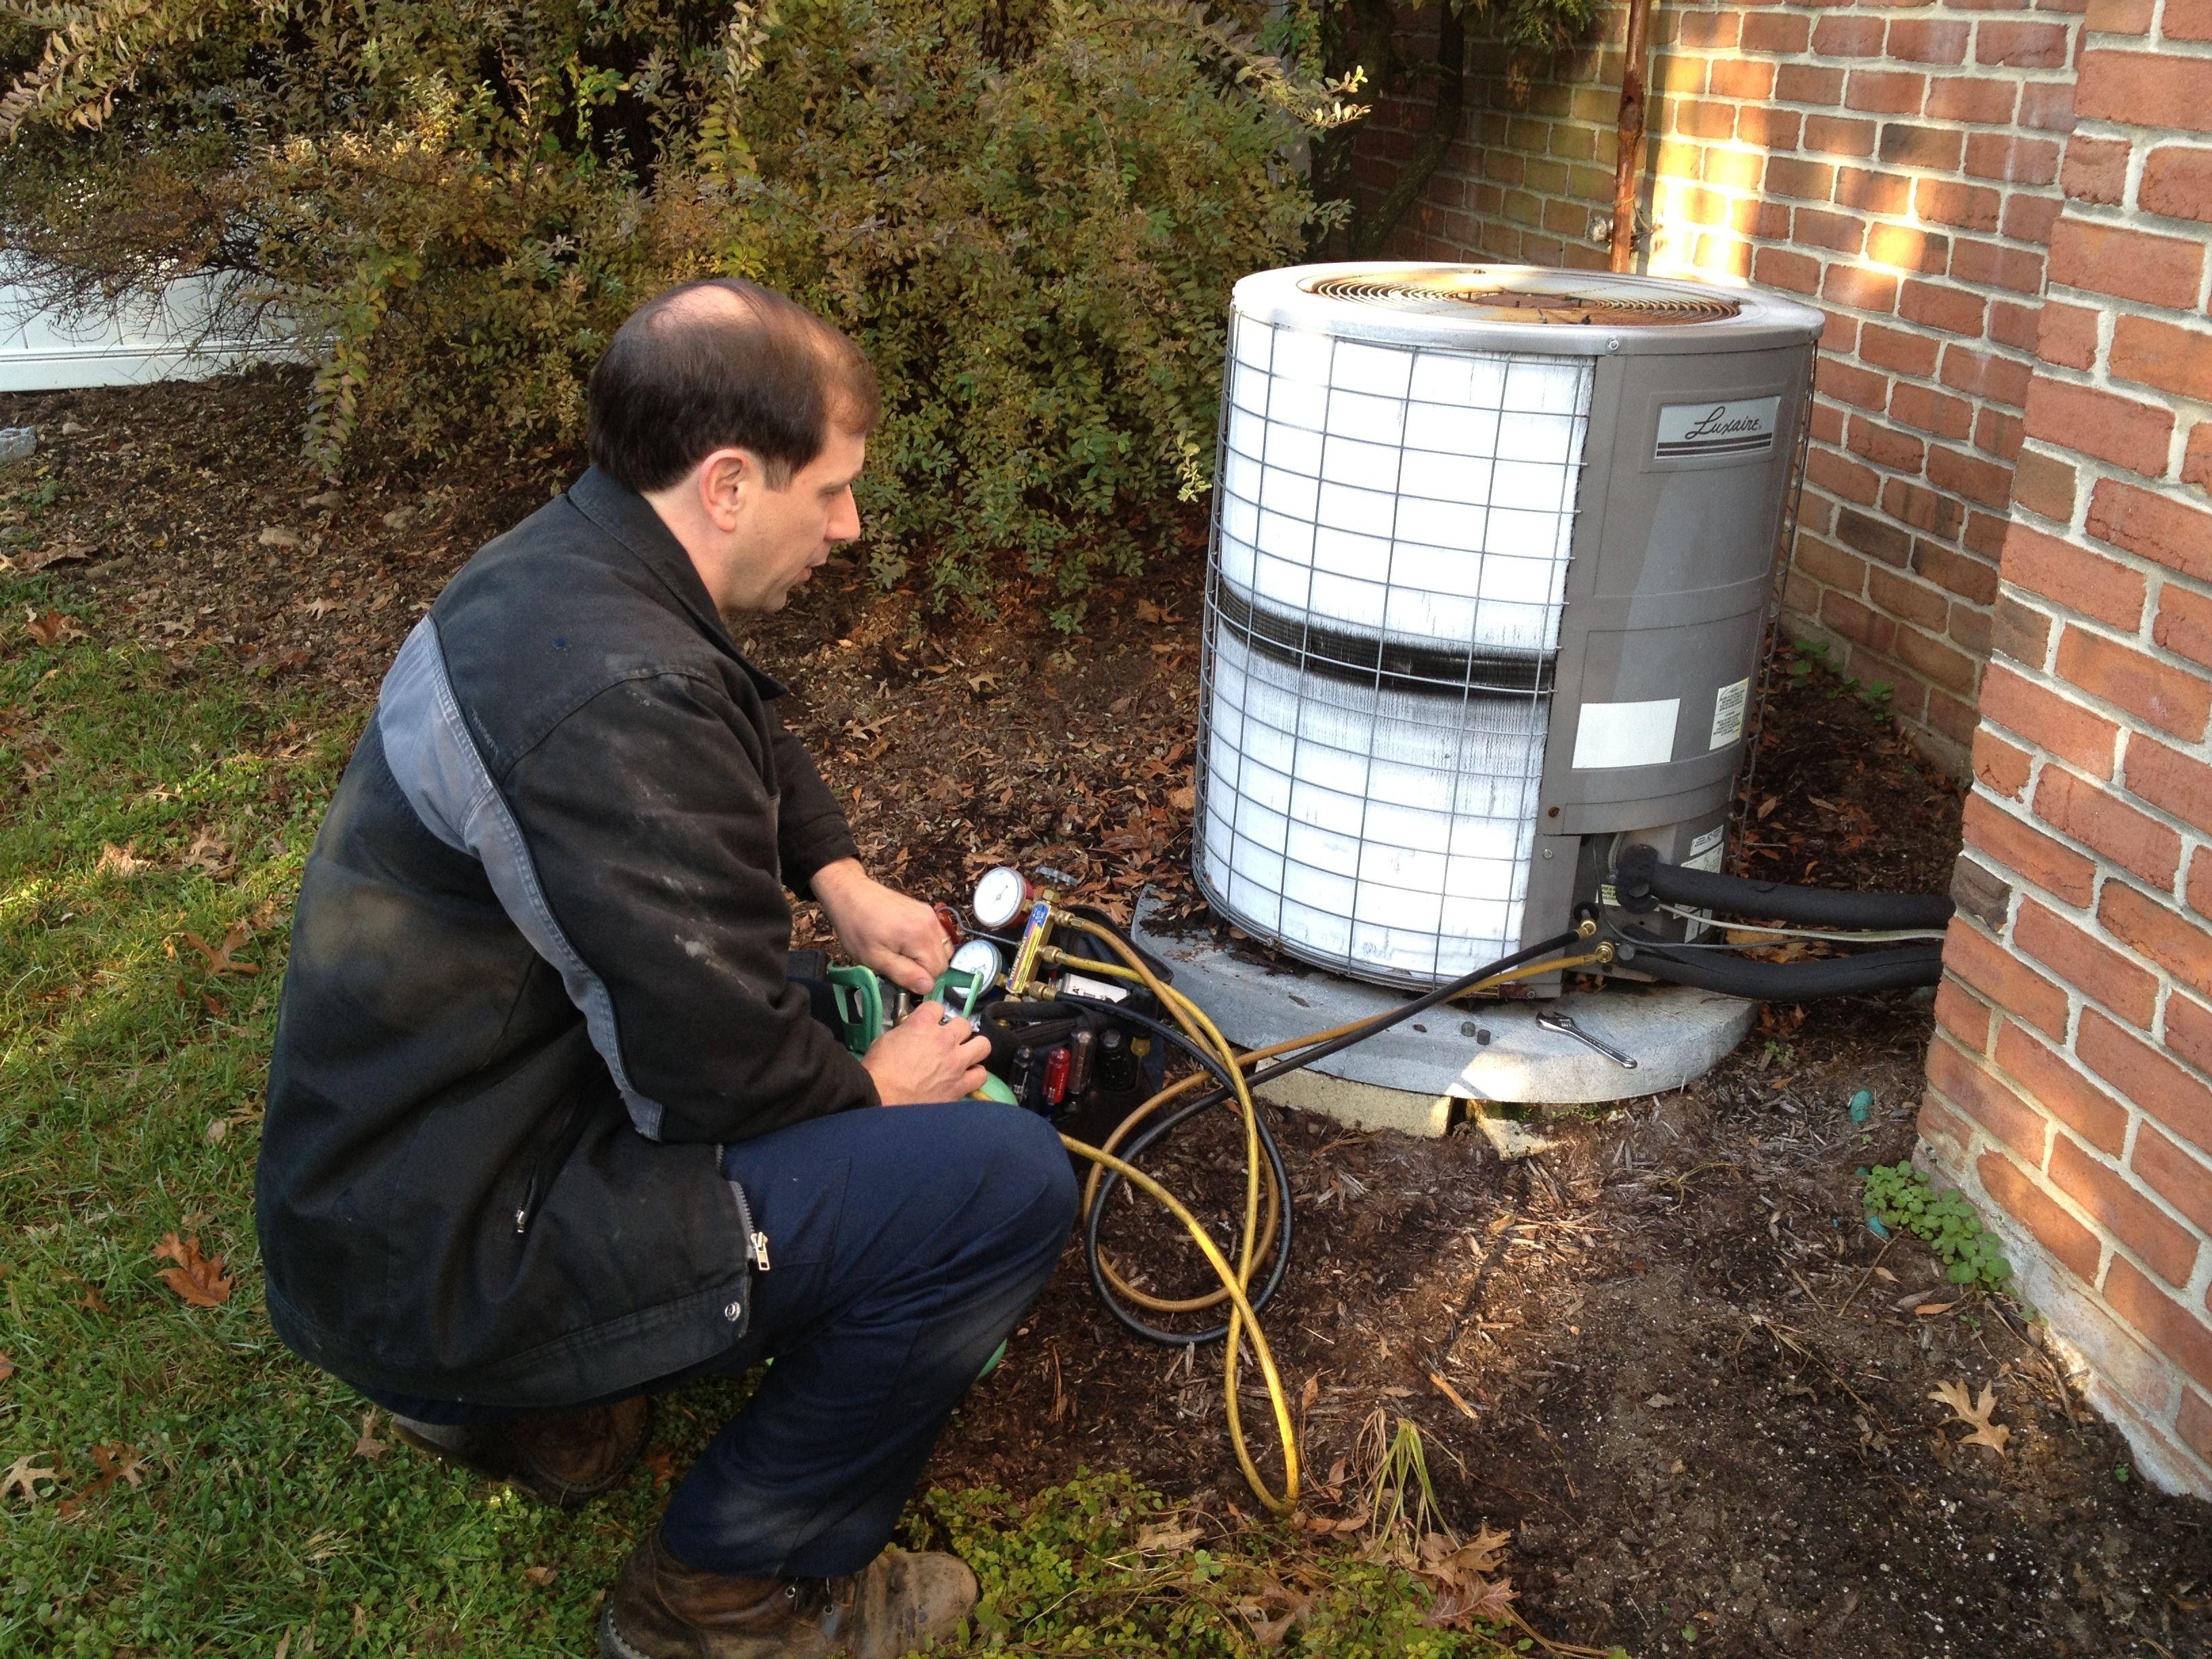 Hvac Service Hvac Services Heating Cooling System Heat Pump